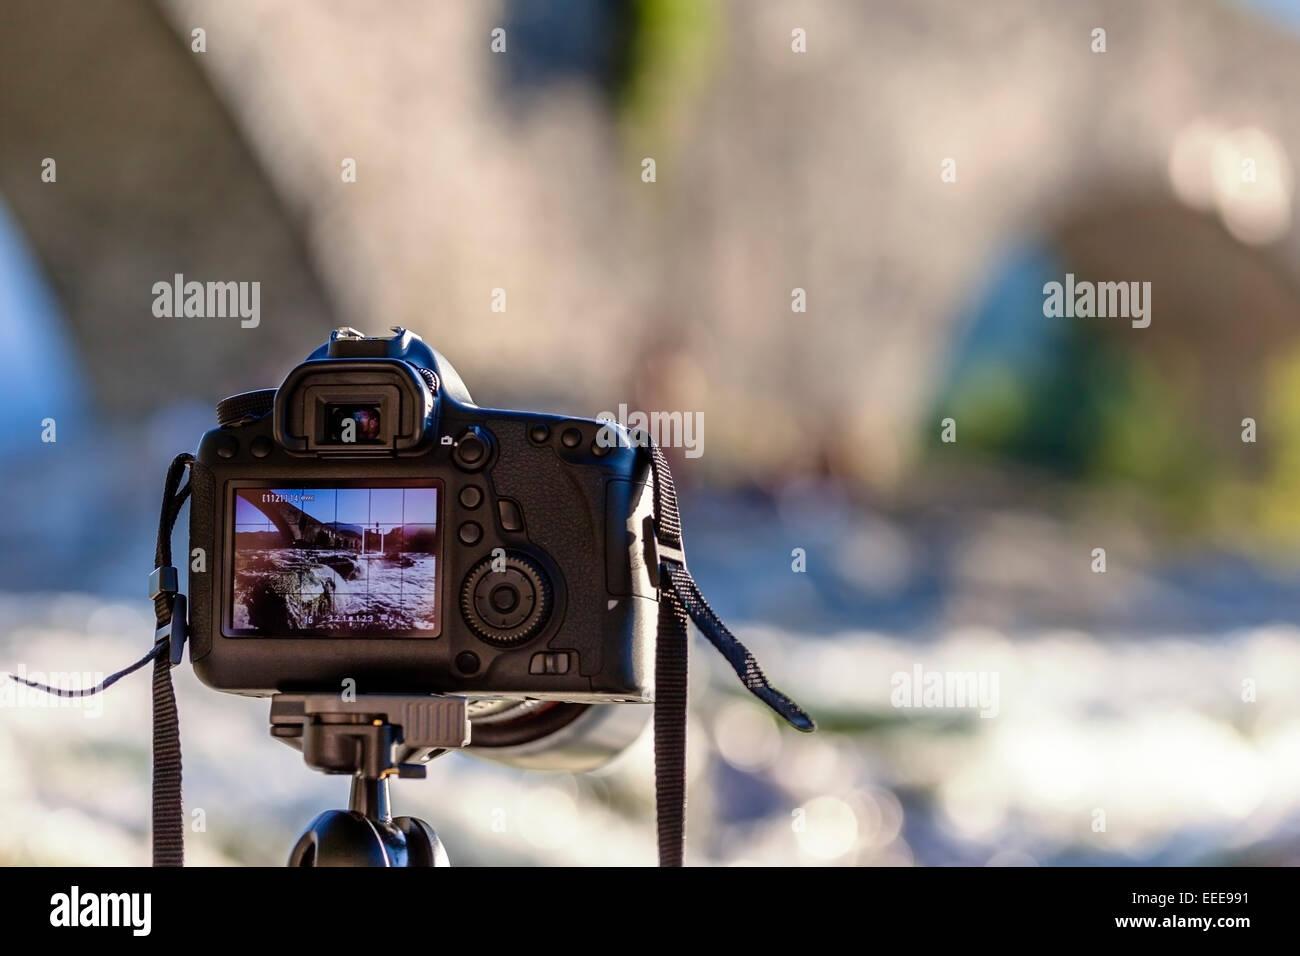 Camera A Ponte.A Dslr Camera On A Tripod Shooting A Bridge Landscape Ponte Di